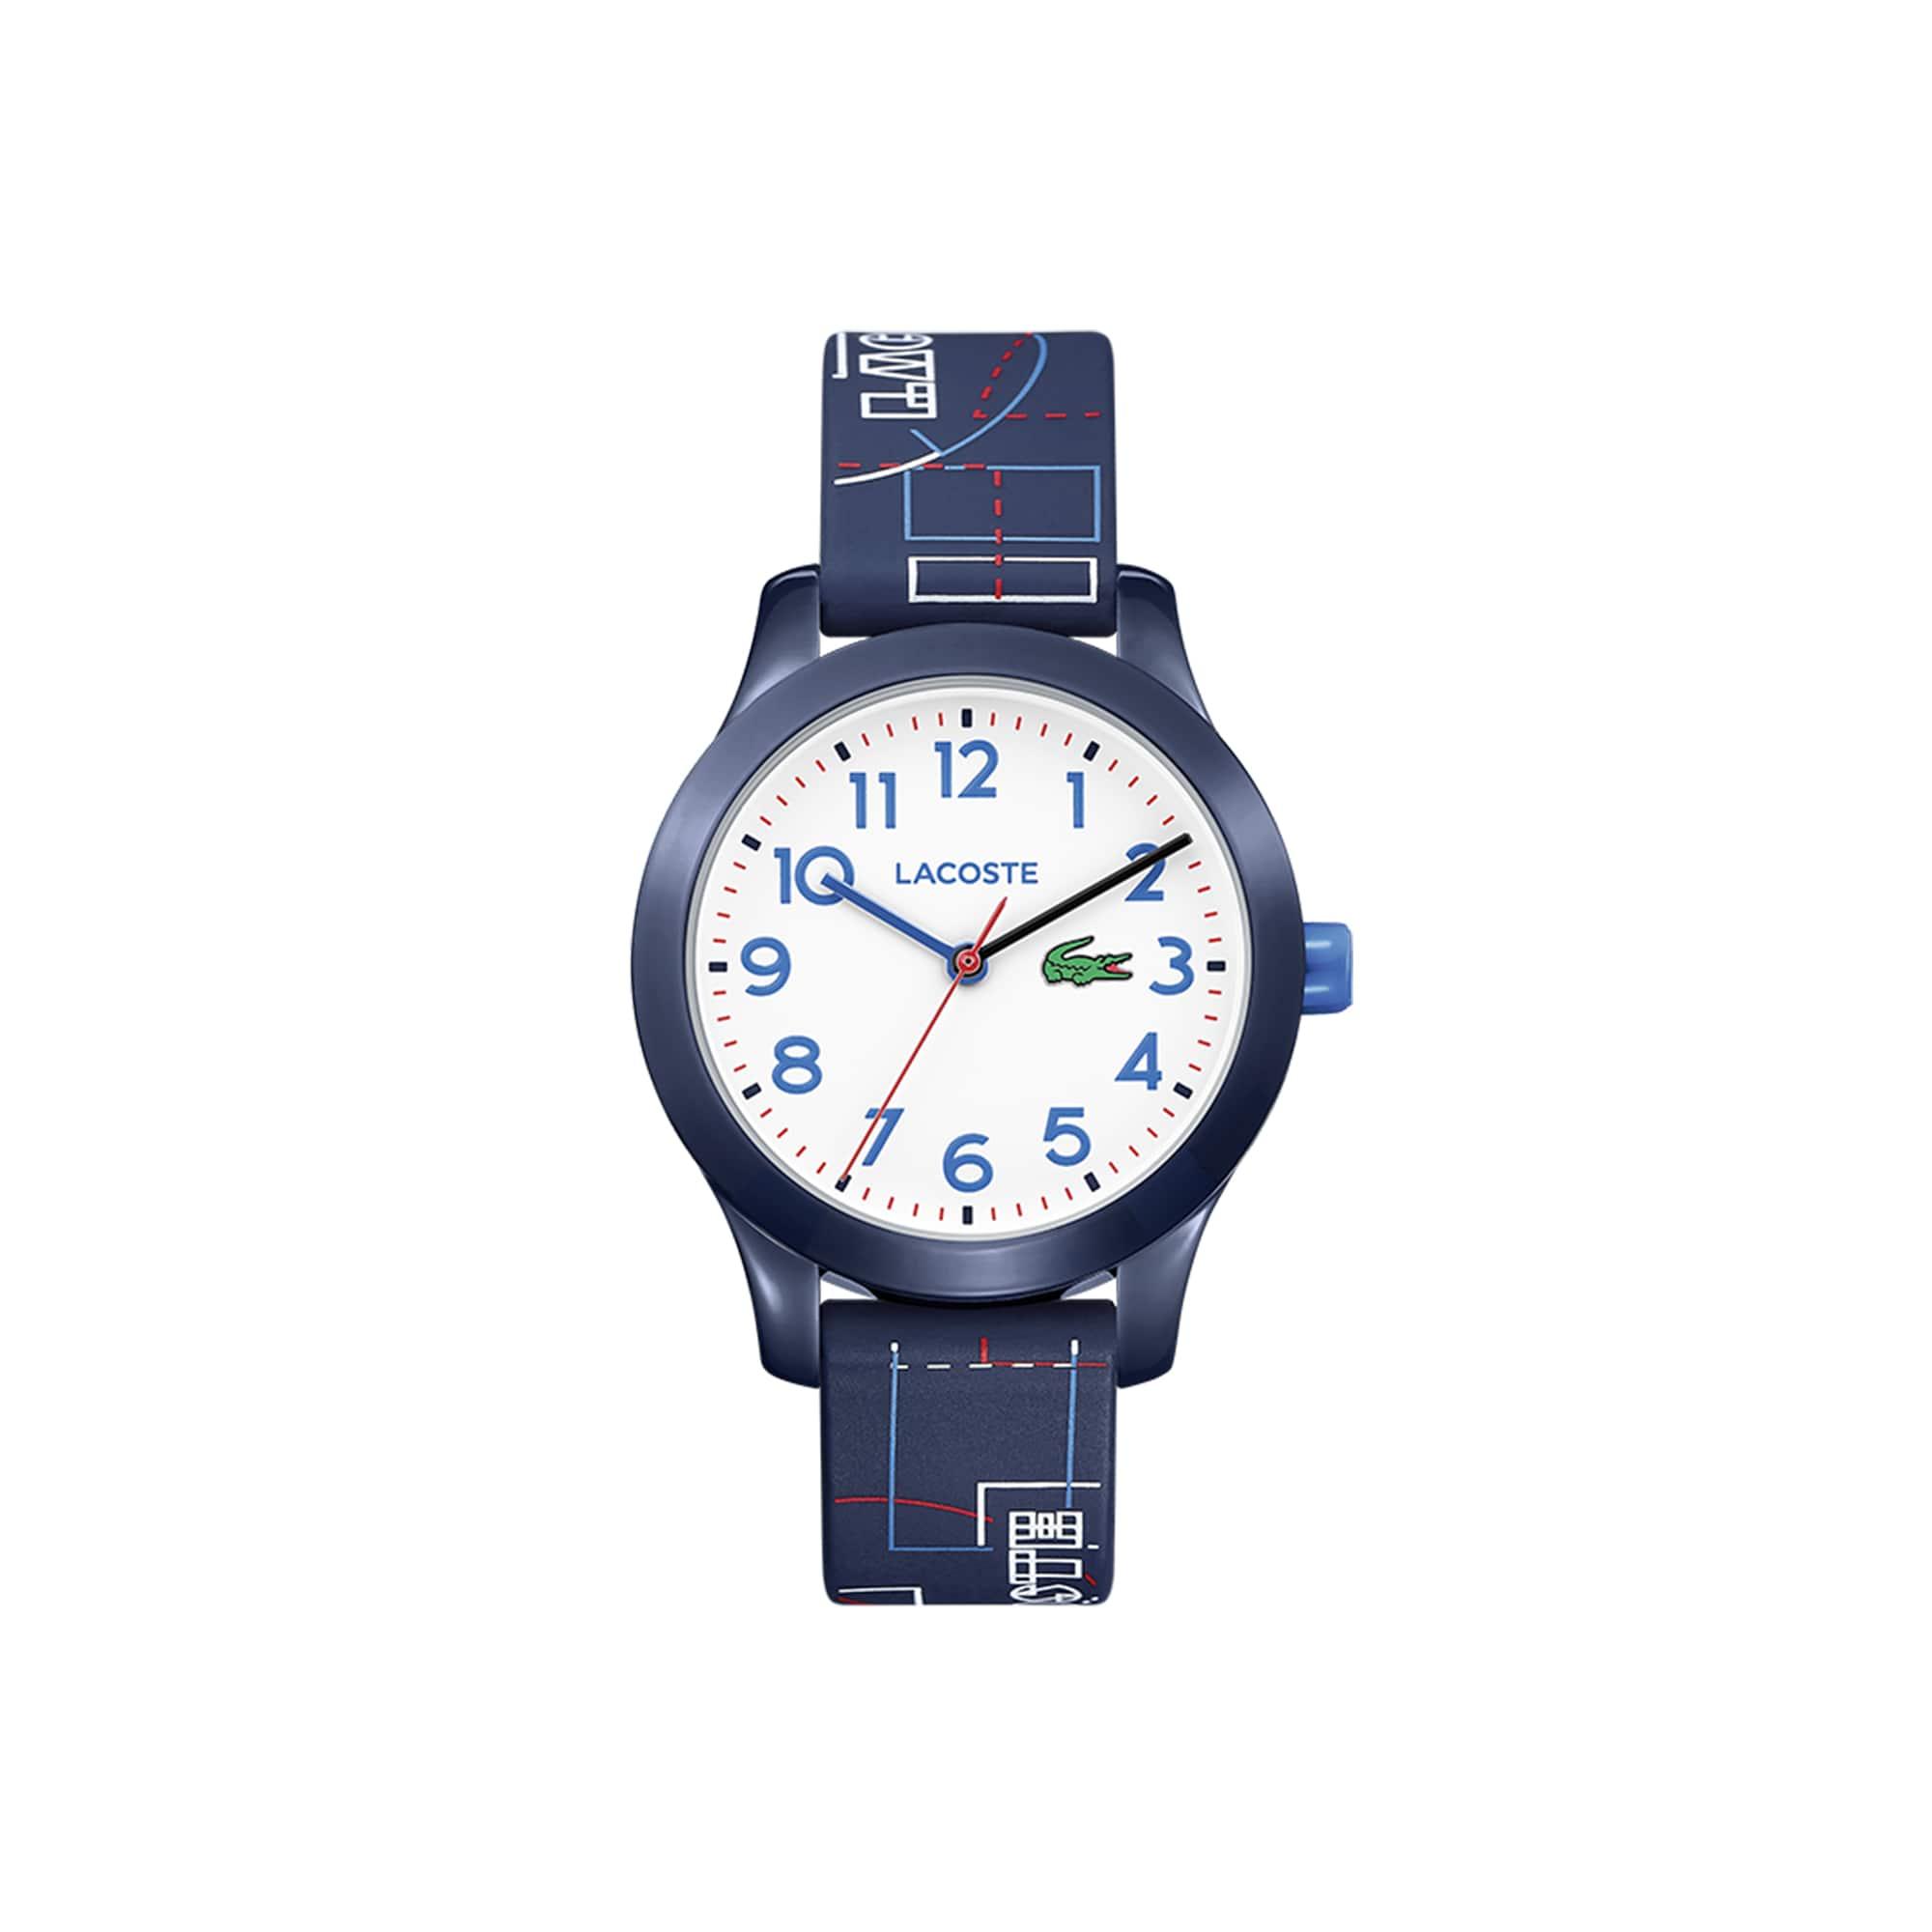 Reloj de Niño Lacoste 12.12 con Correa de Silicona Azul